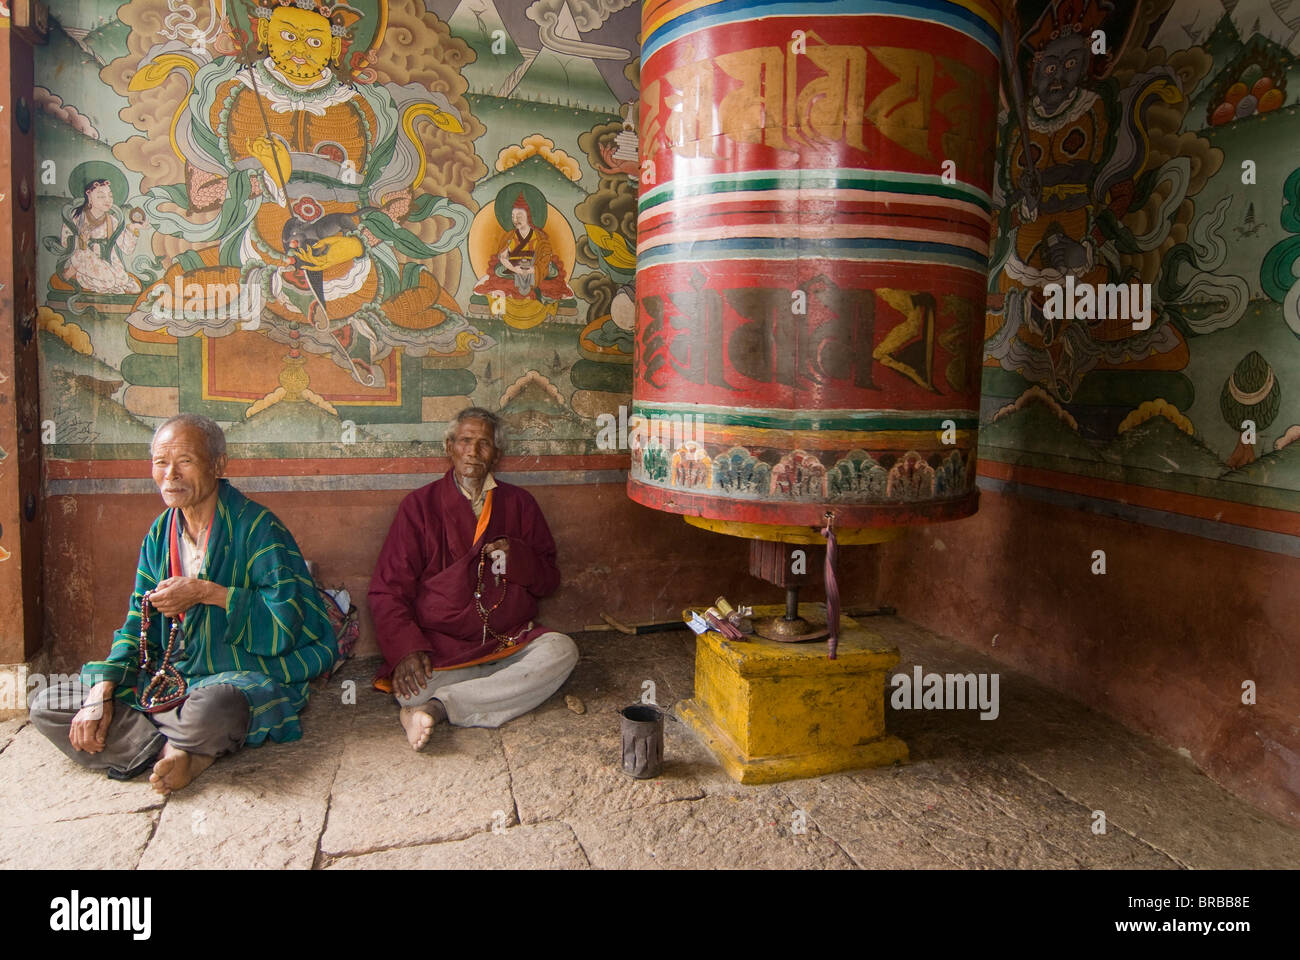 Old Buddhist monks, Chimi Lhakhang, Bhutan - Stock Image